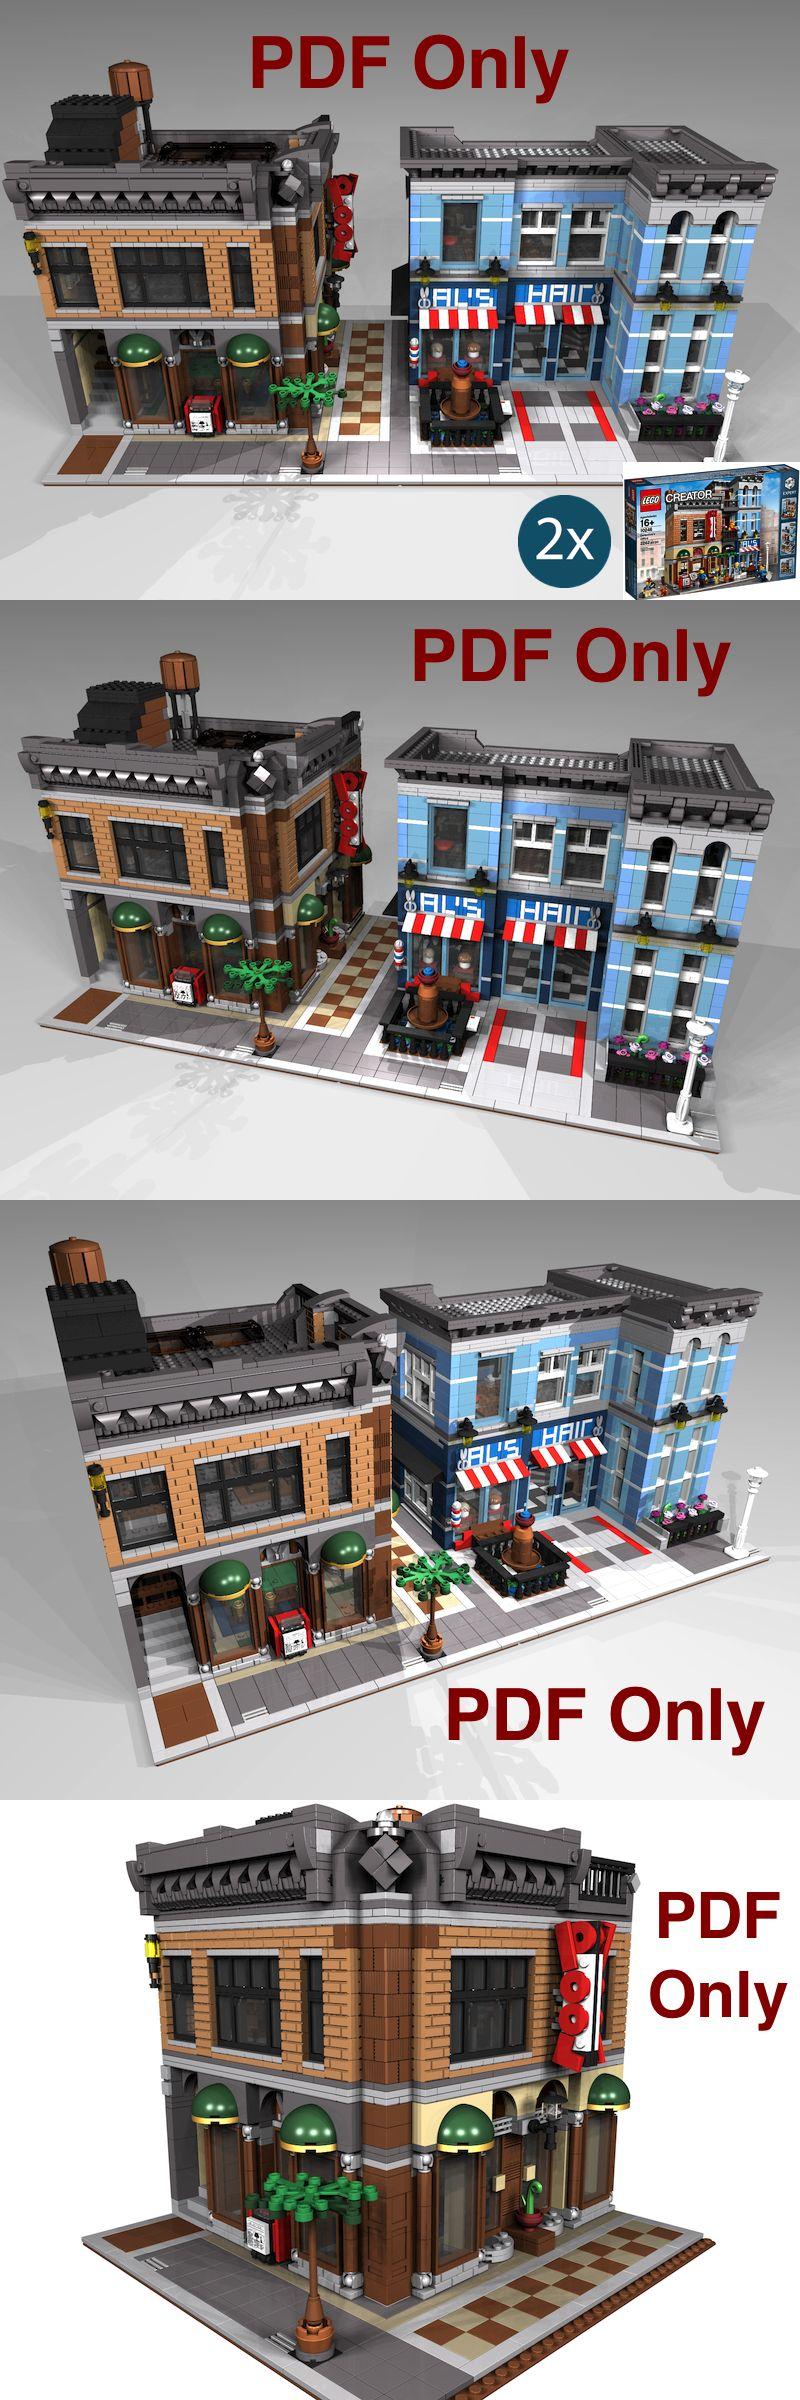 Lego Custom Modular Instructions Detective/'s Office Neighborhood 10246 PDF Only